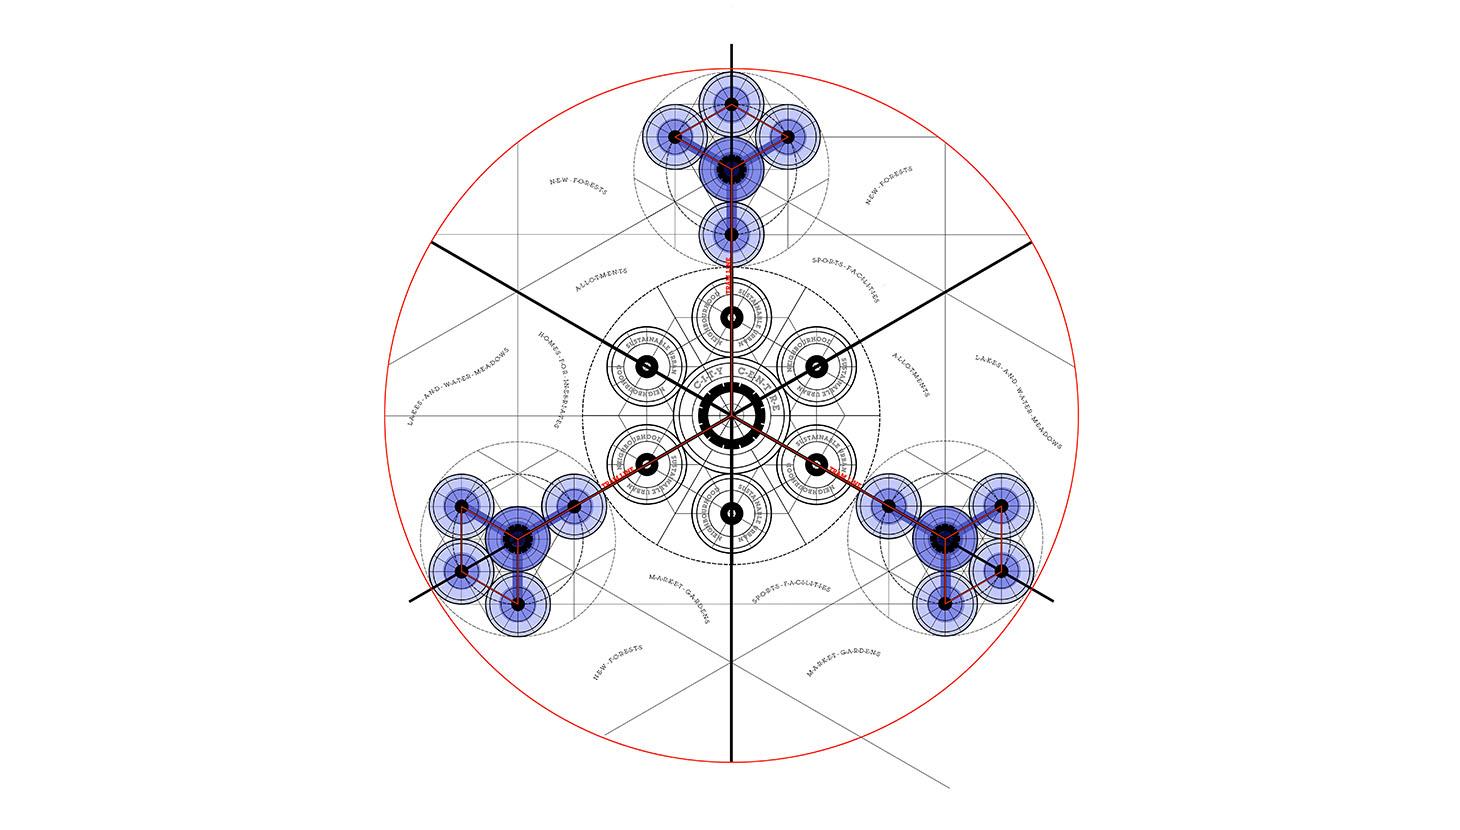 Uxcester - Snowflake Diagram (2)